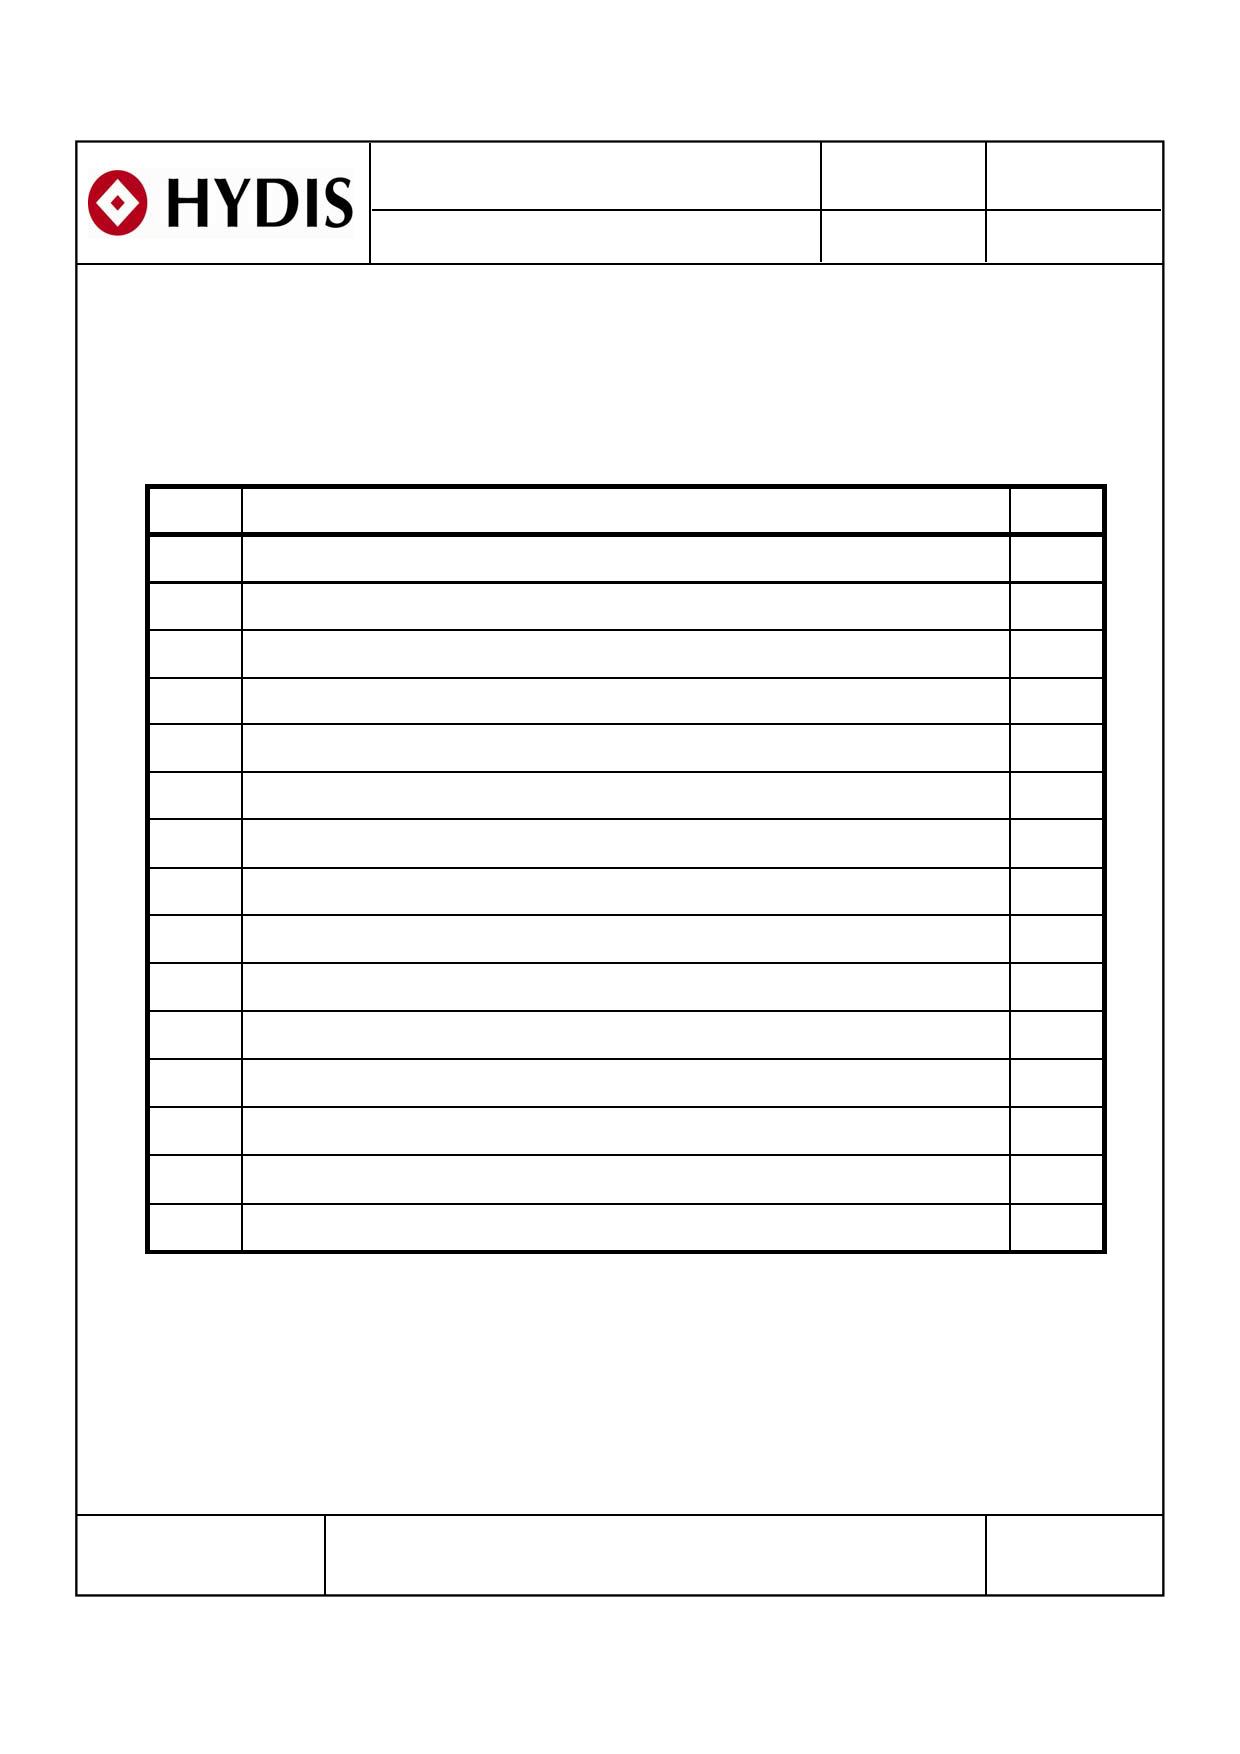 HV089WX1-100 pdf, ピン配列